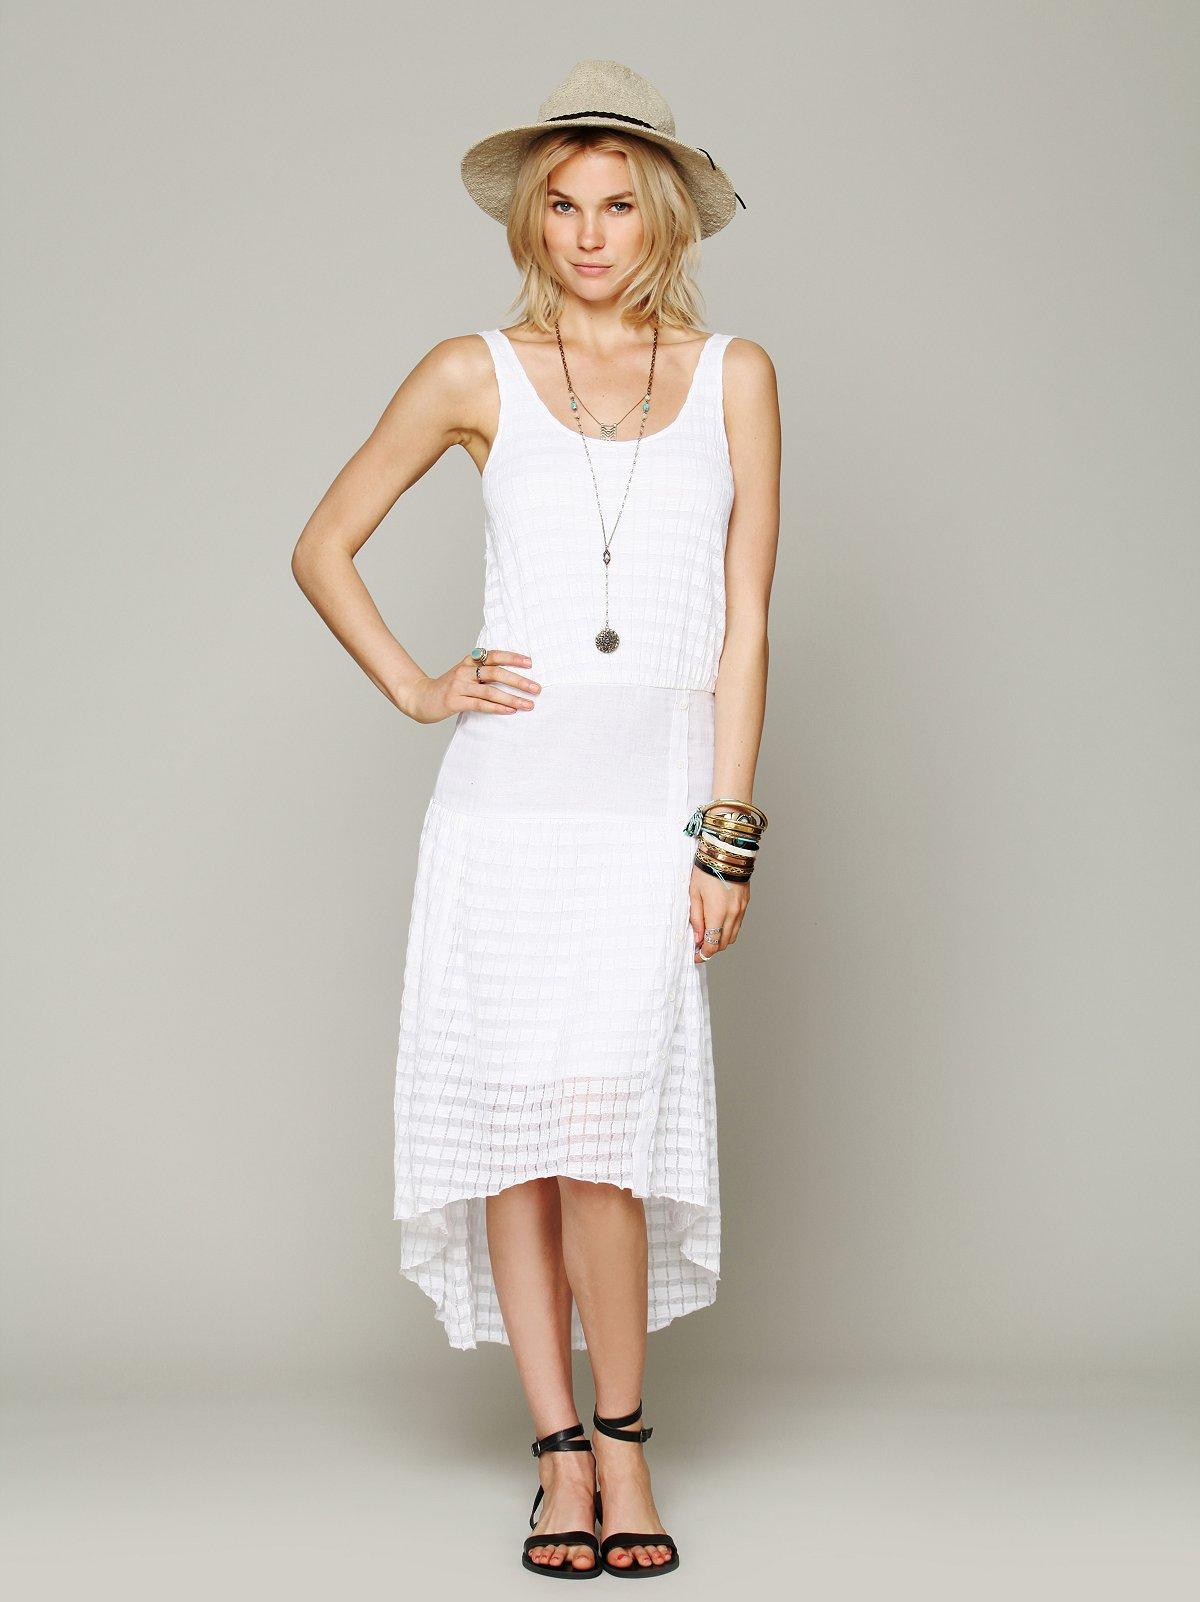 FP New Romantics It's My Party Dress